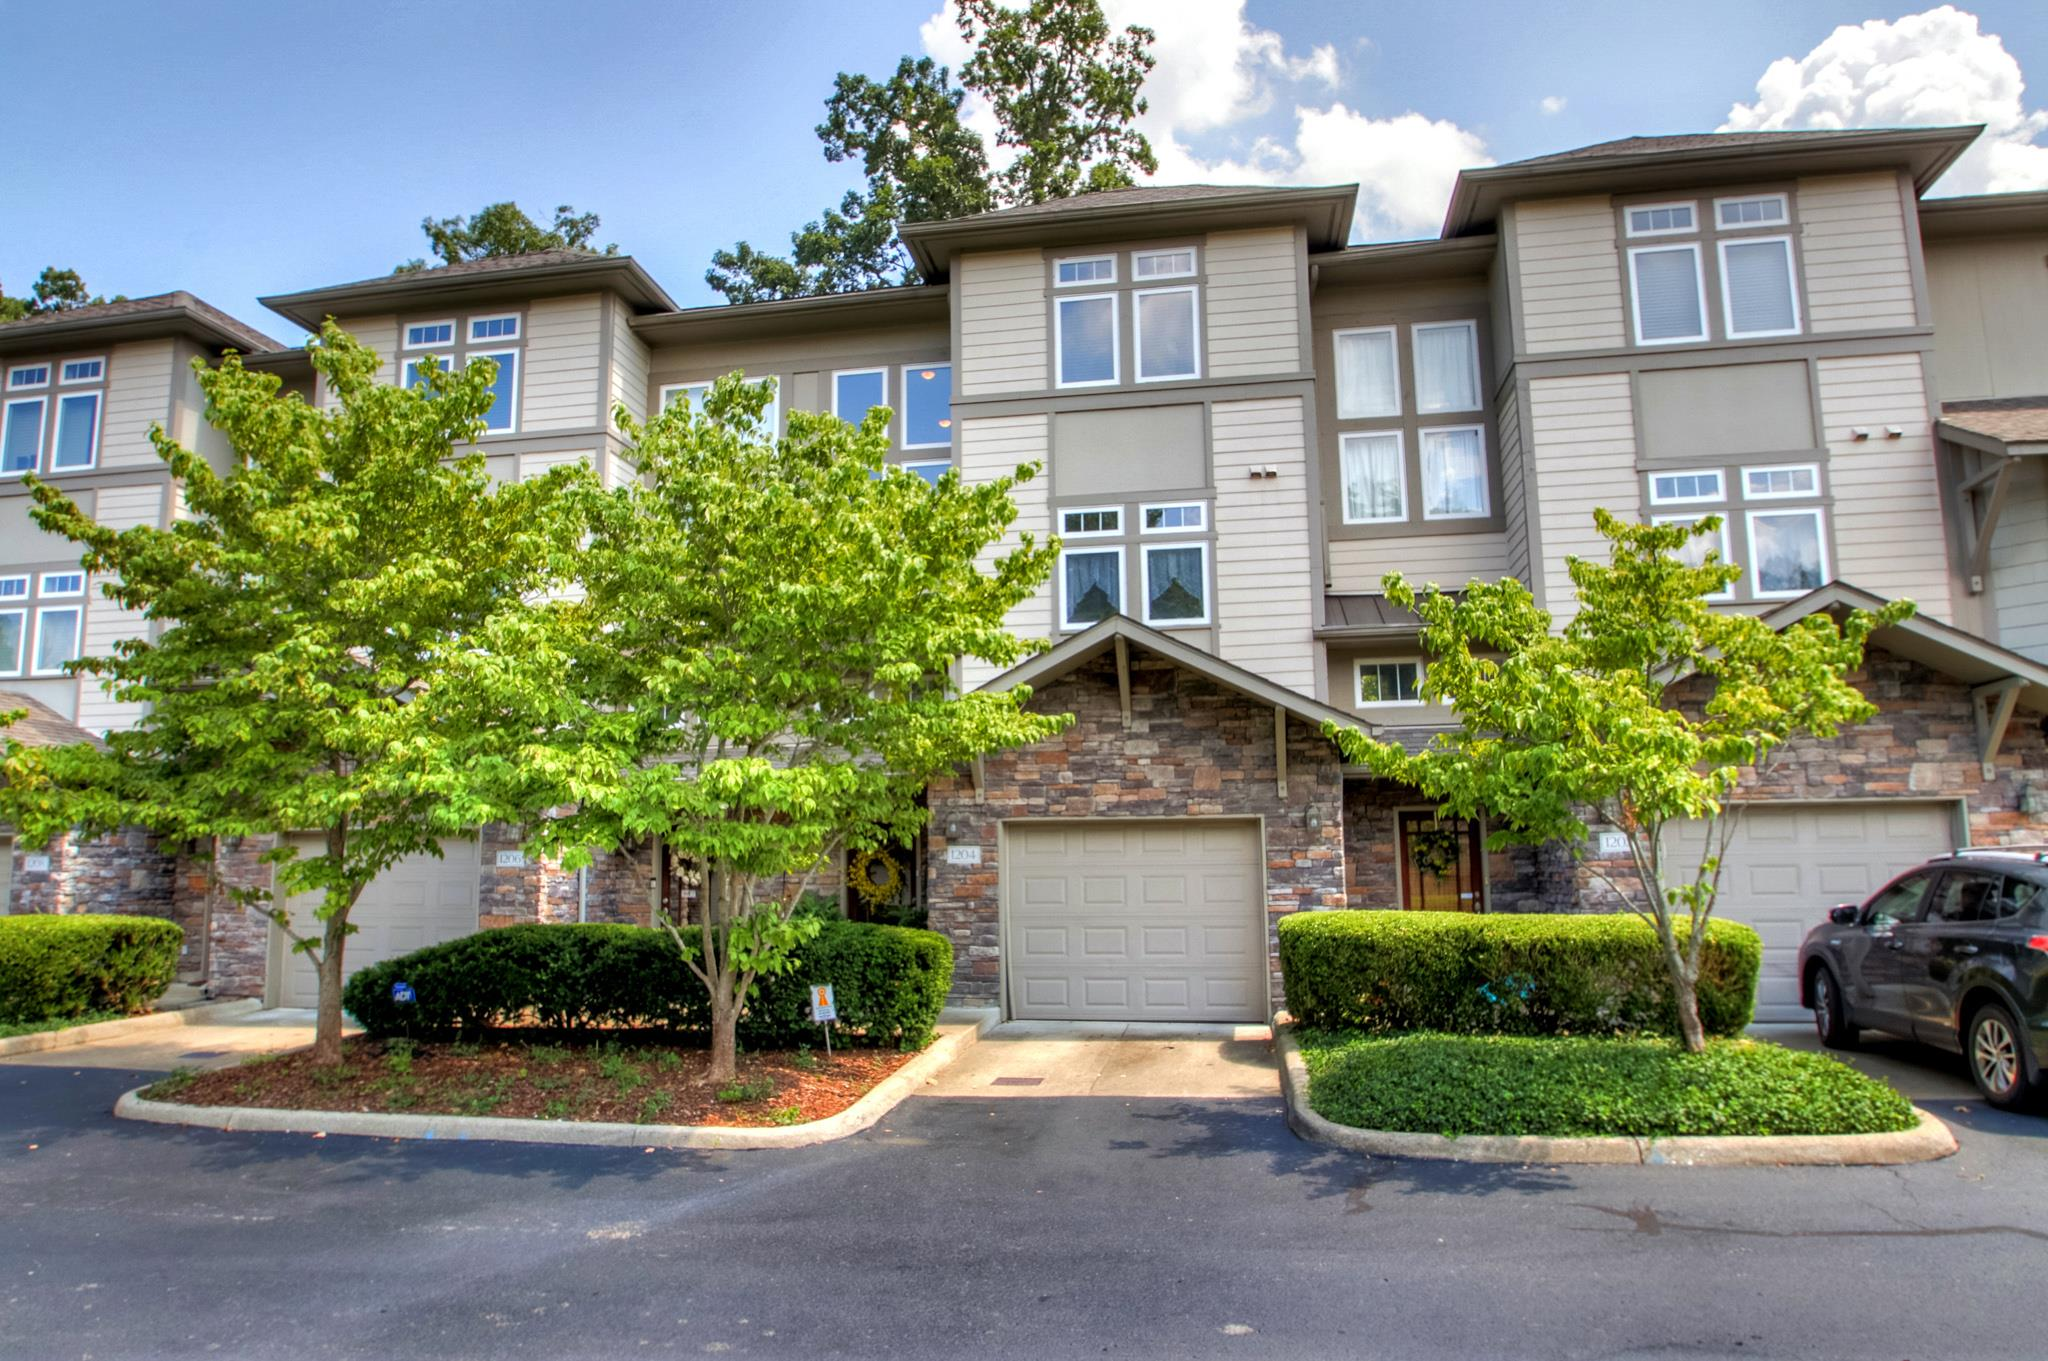 320 Old Hickory Blvd Apt 1204, Nashville, TN 37221 - Nashville, TN real estate listing